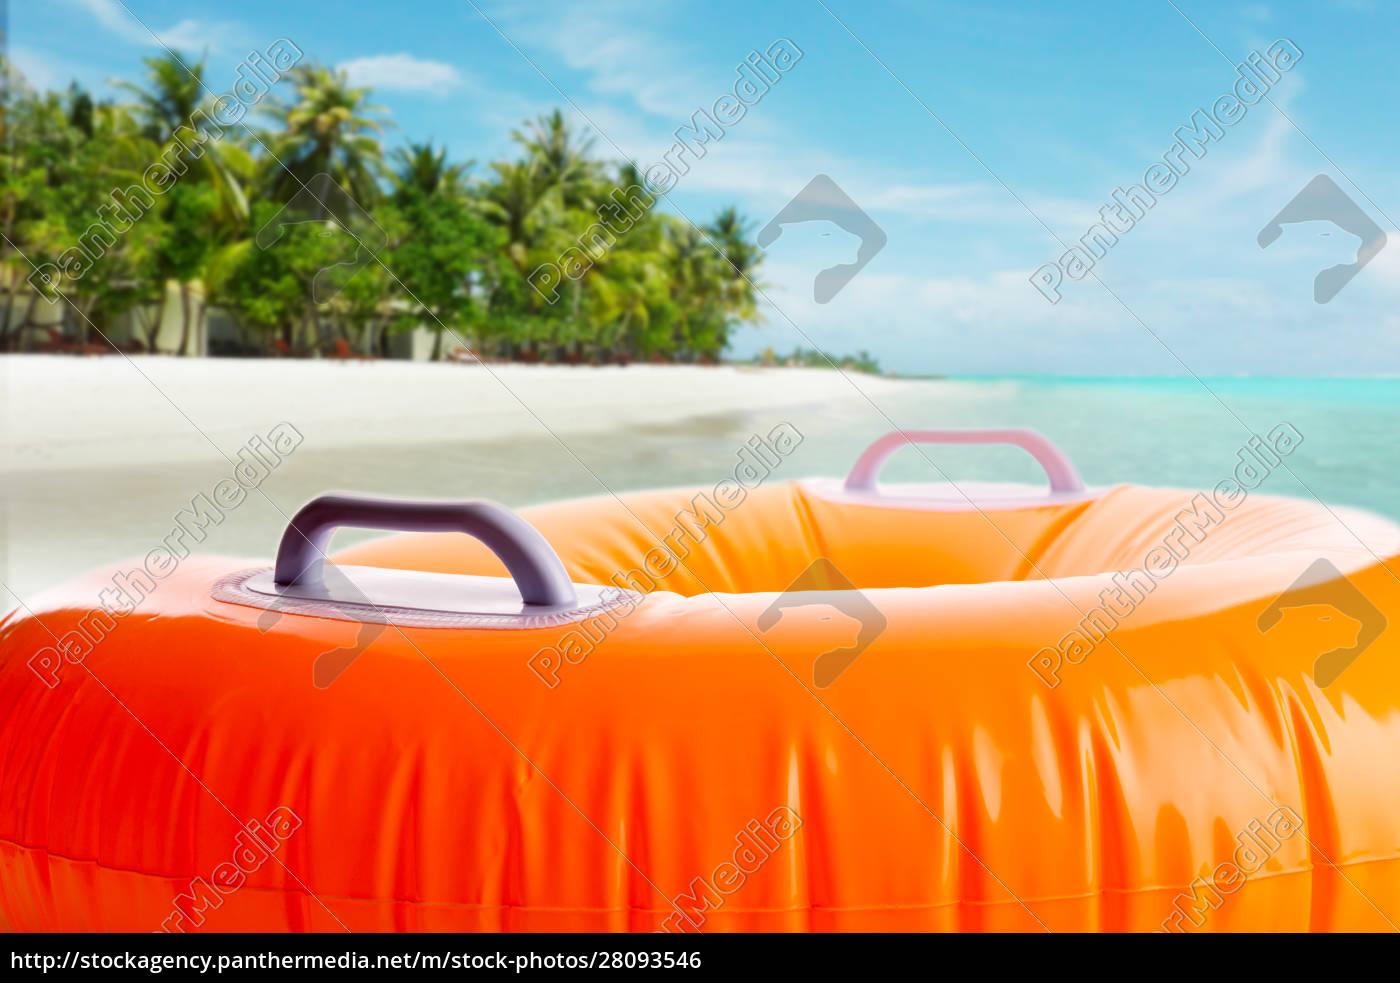 inflatable, orange, cushion, on, the, beach - 28093546